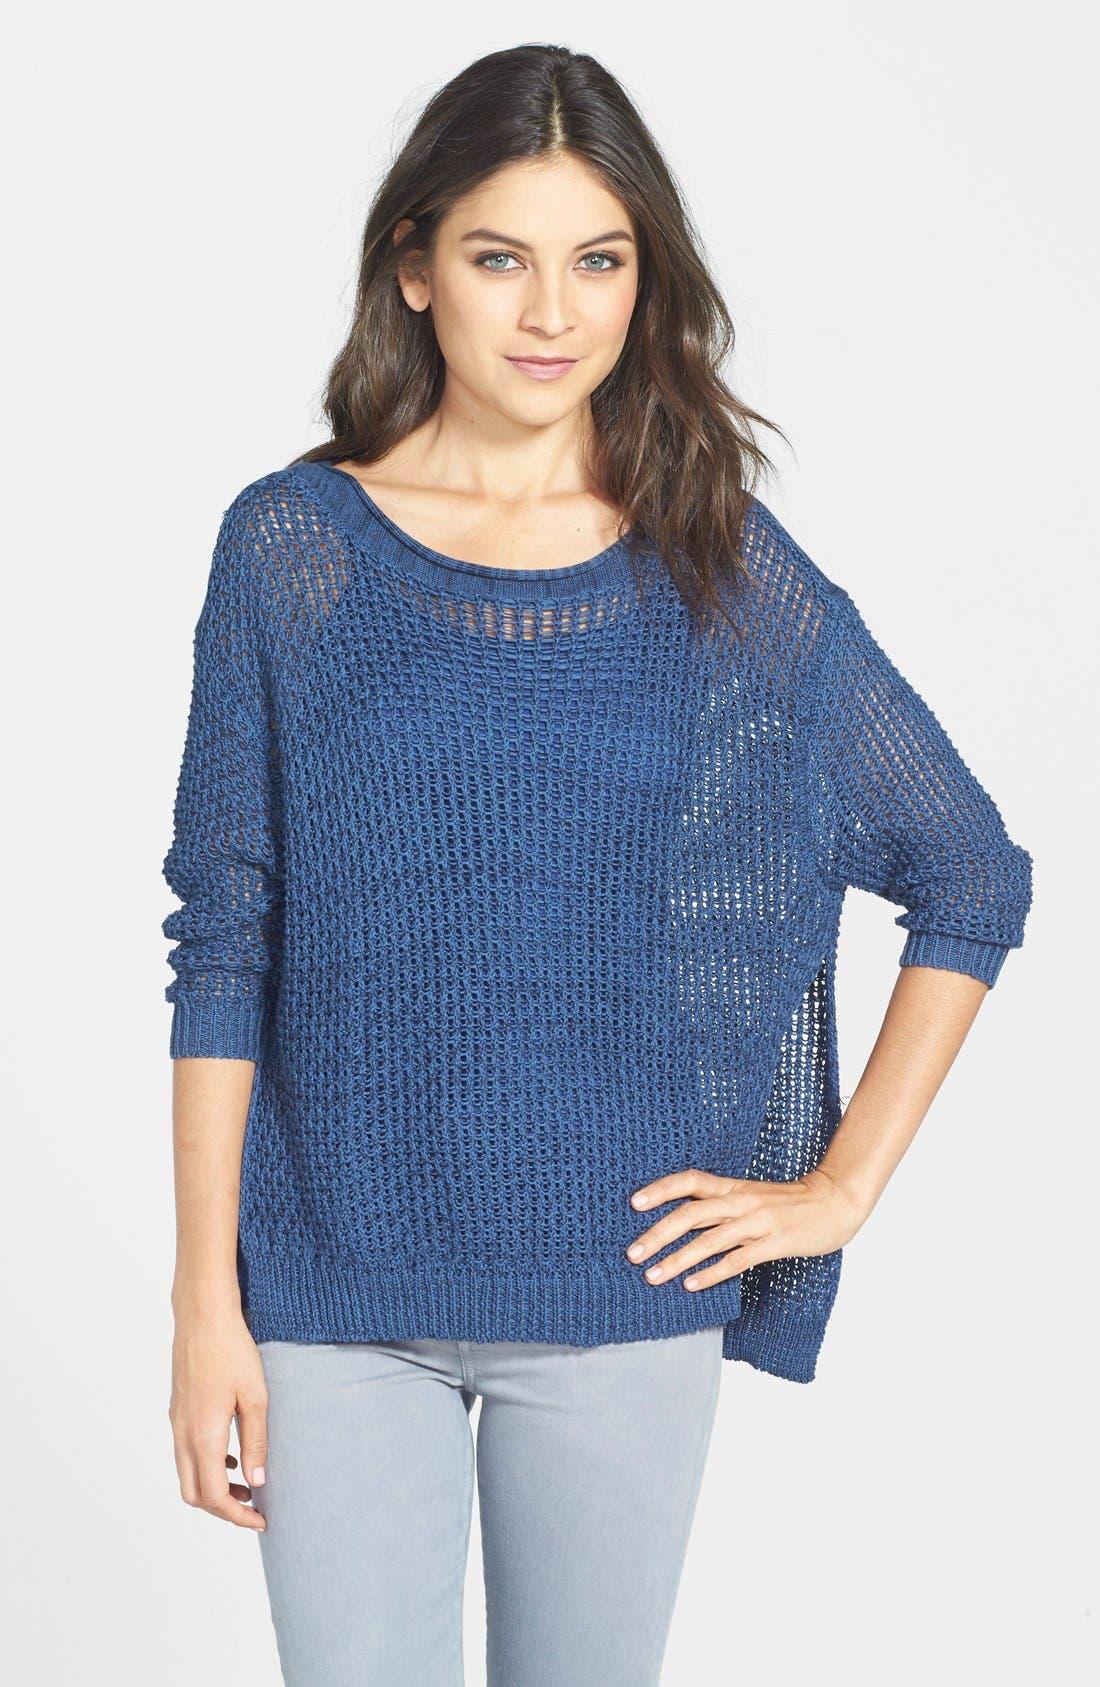 Alternate Image 1 Selected - Dex High/Low Hem Open Stitch Sweater